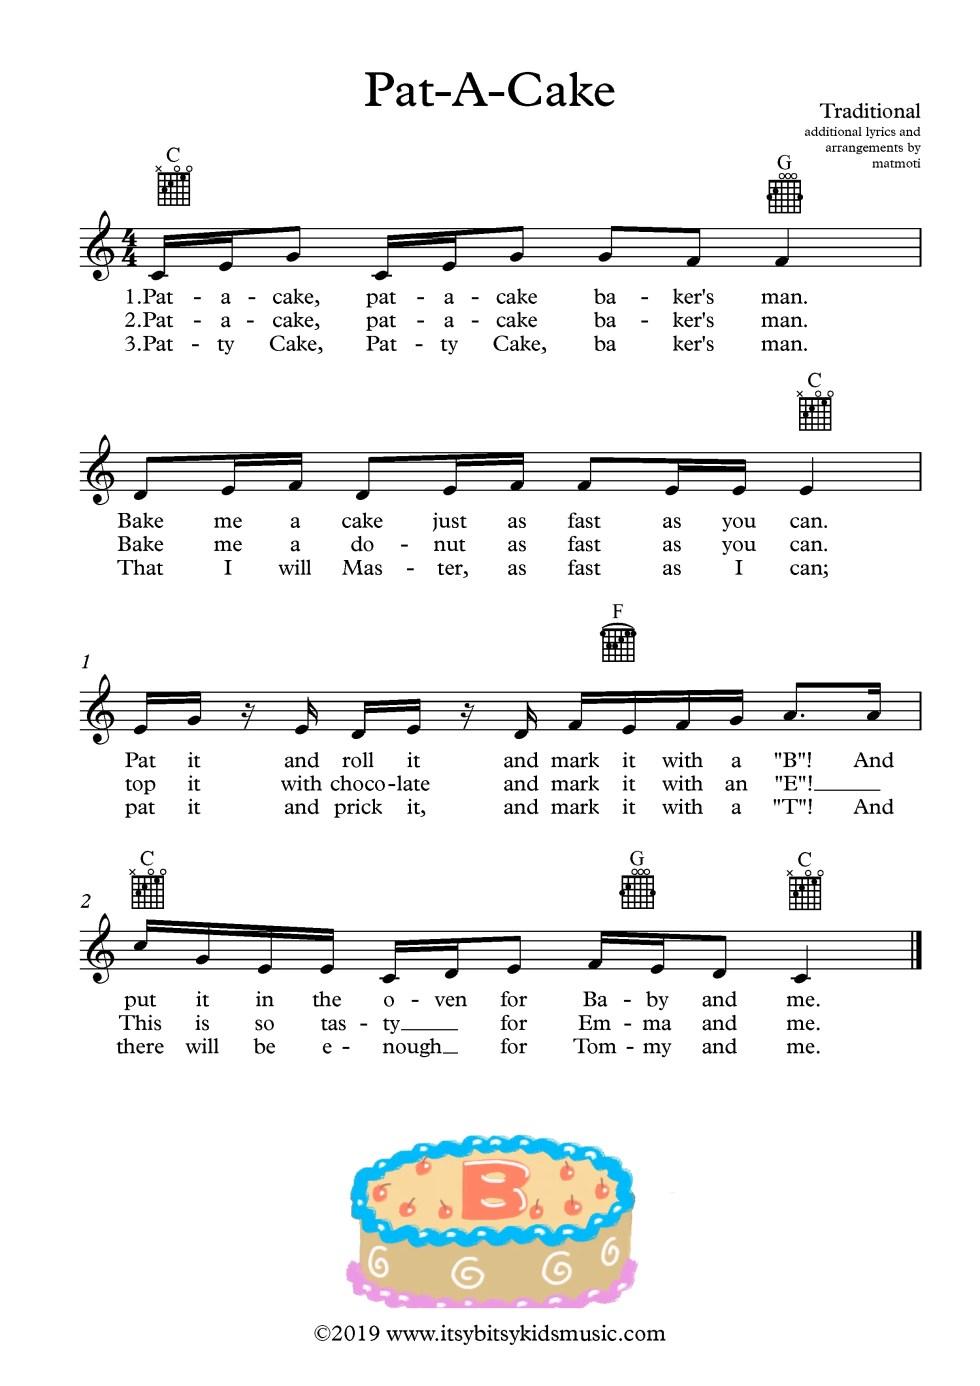 Pat-A-Cake Sheet Music With Guitar Chords And Lyrics